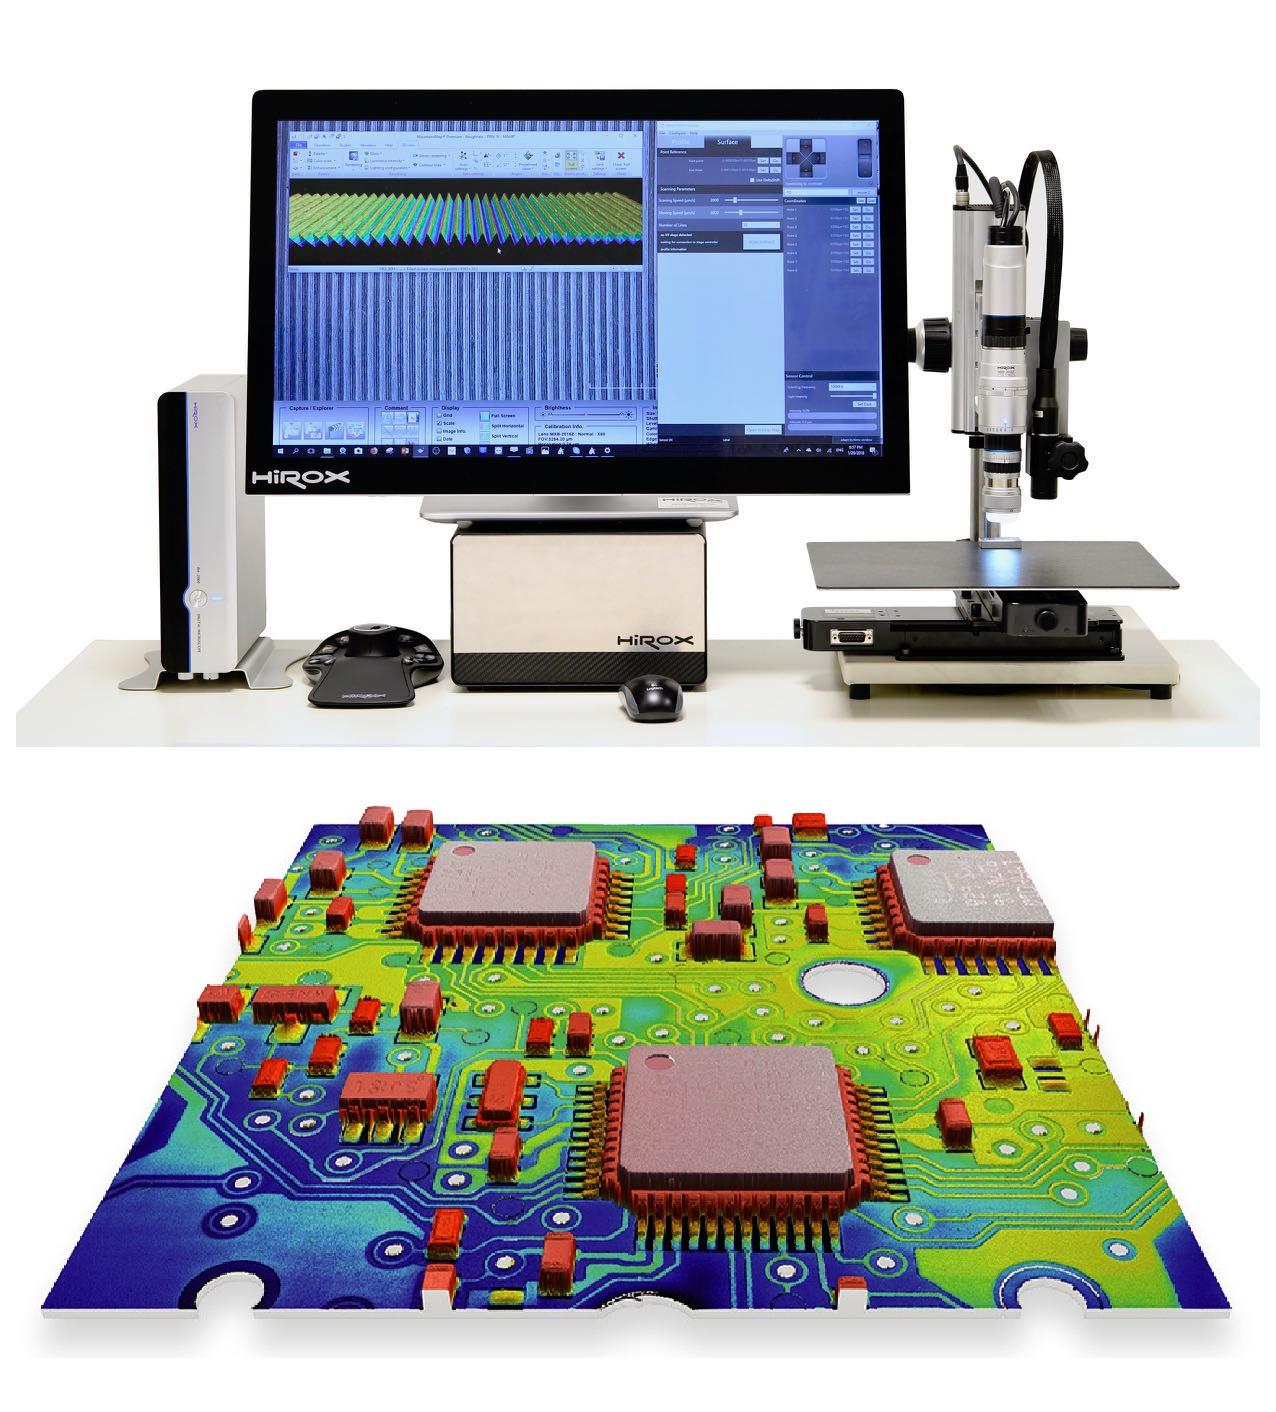 Hirox NPS – Nano Point Scanner